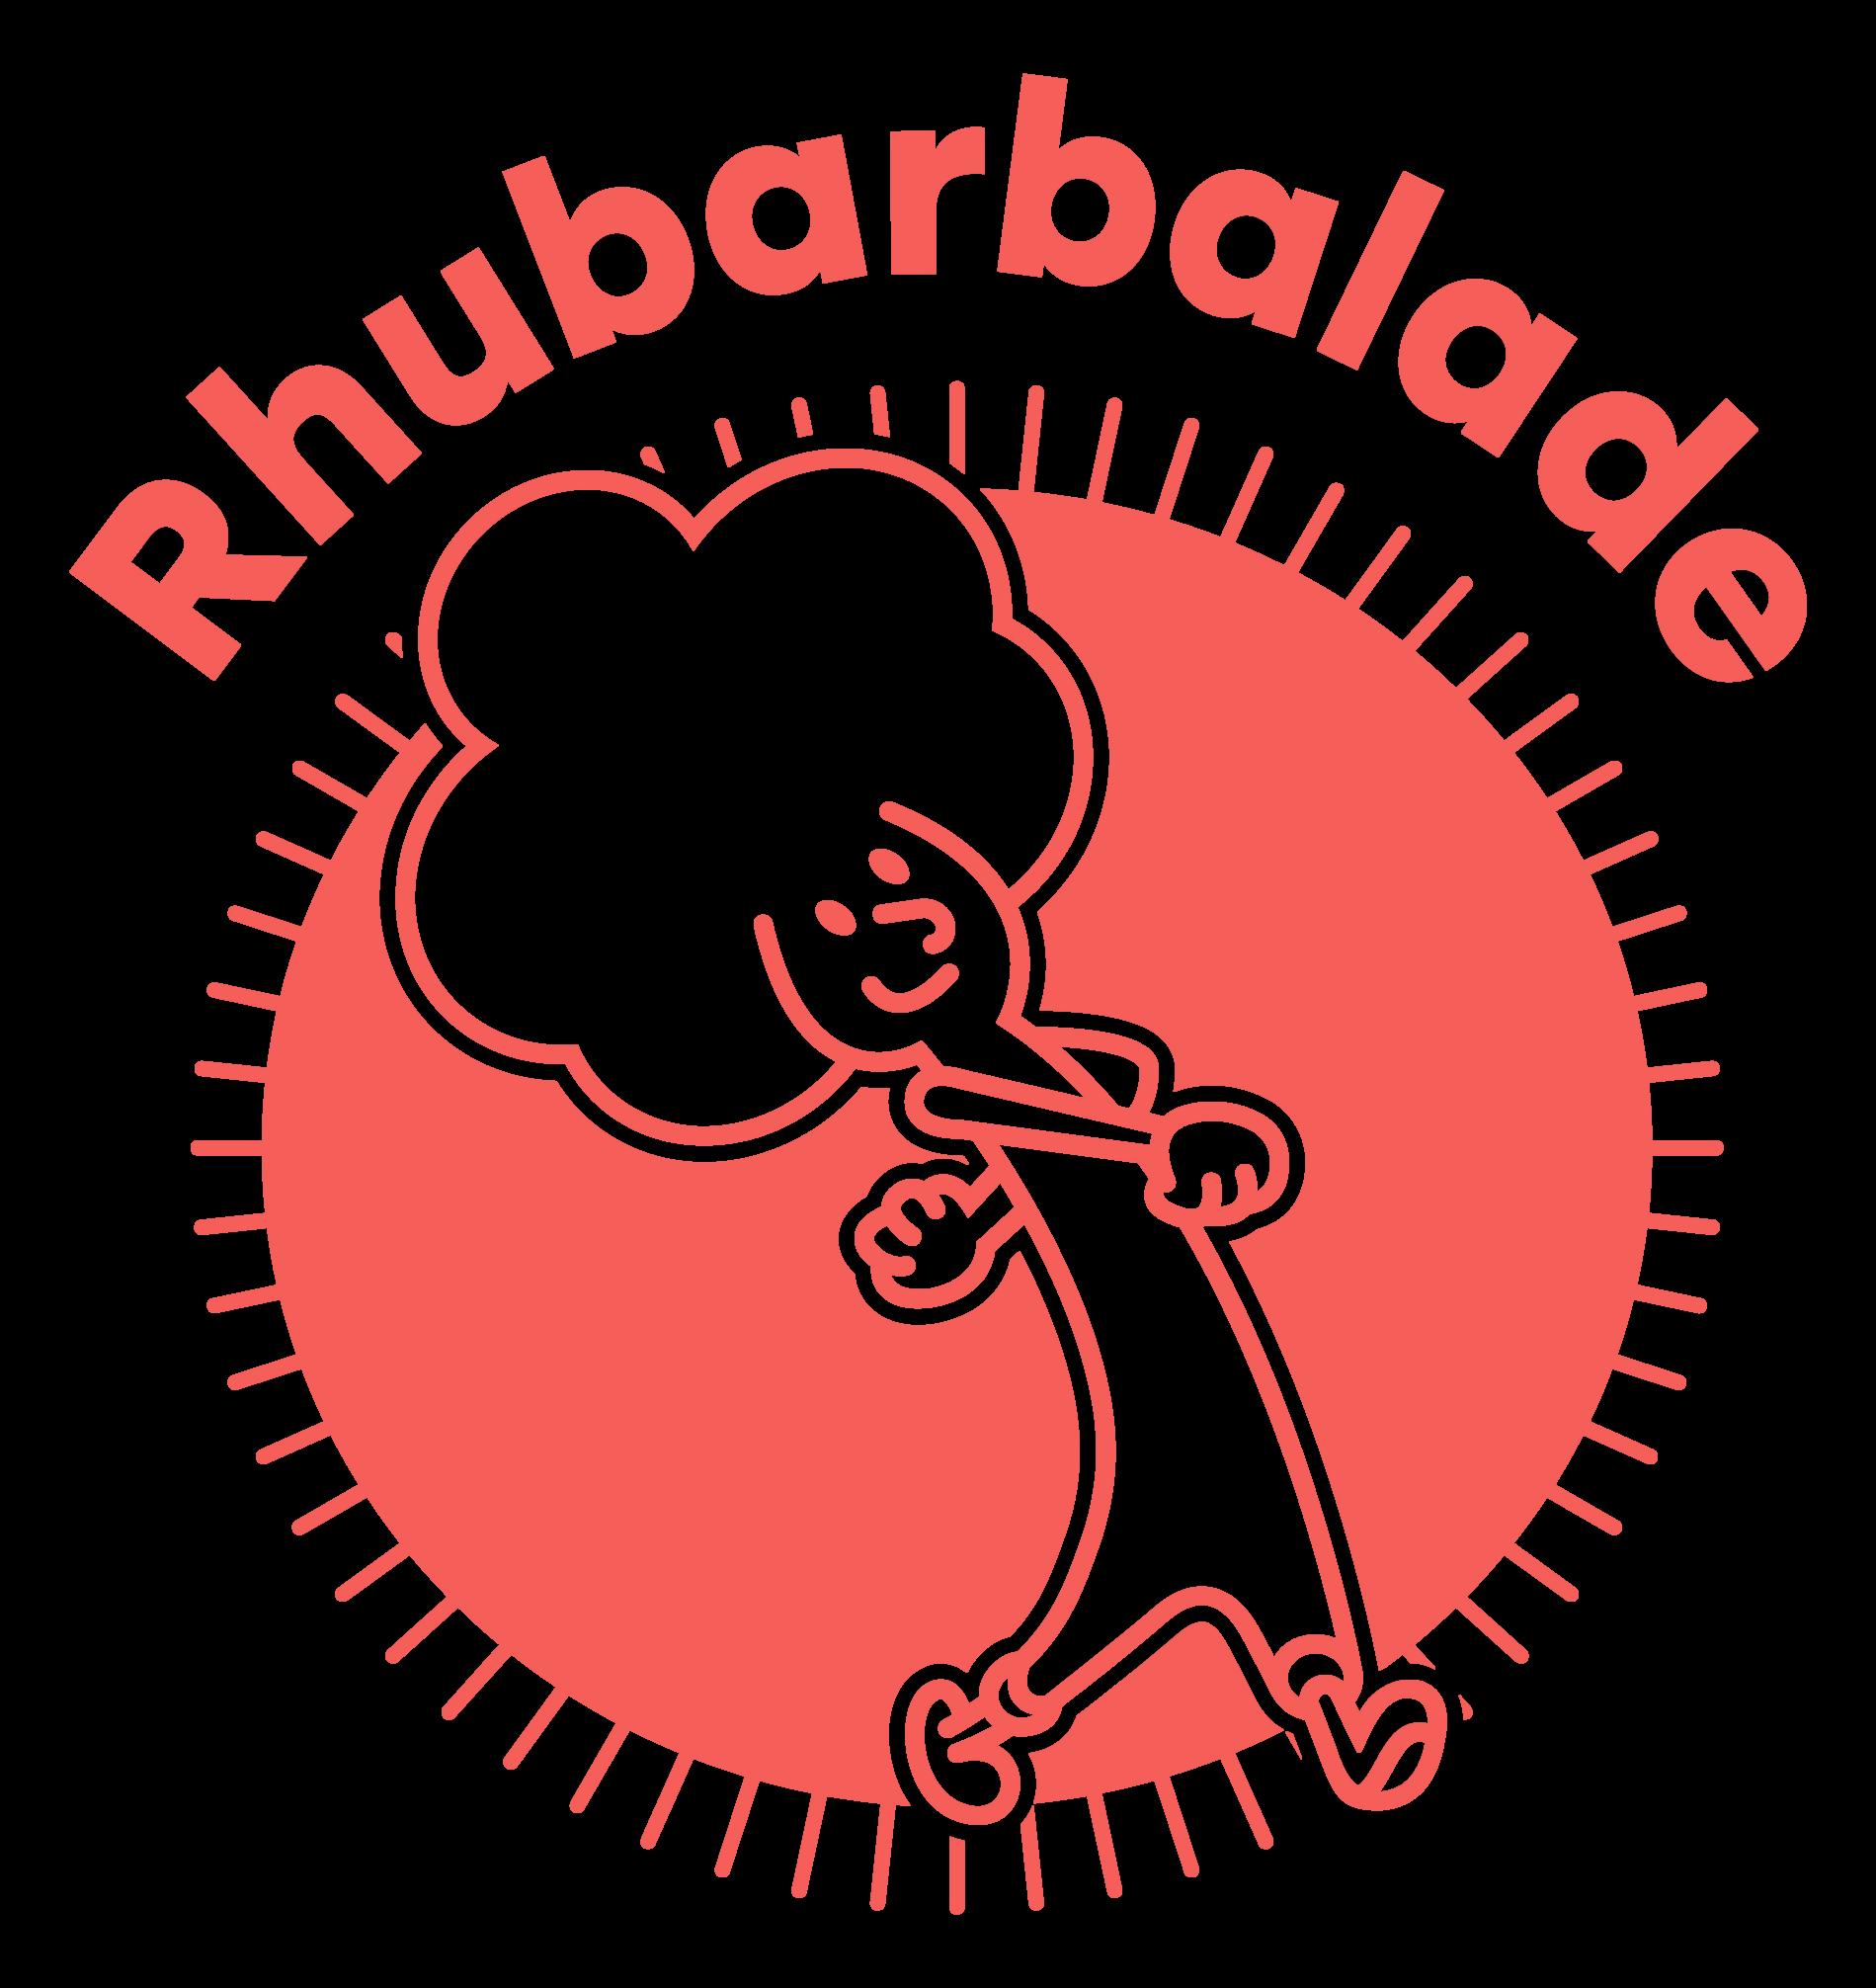 Rhubarbalade logo